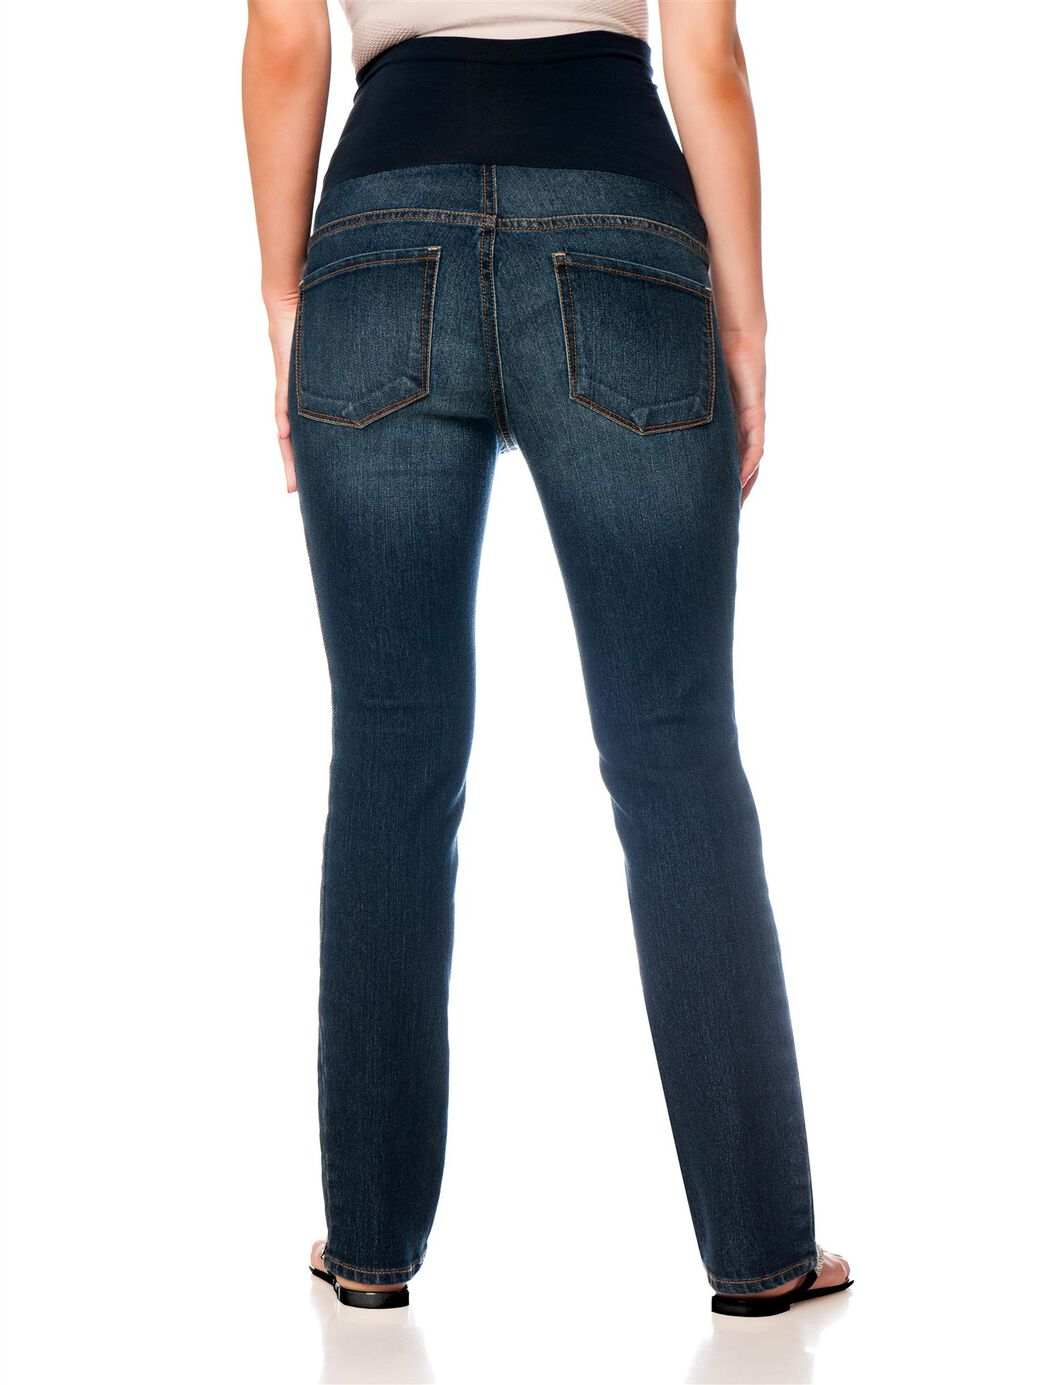 indigo blue premium maternity jeans secret fit belly (r) us patent nos re re and medium wash skinny leg 5 pocket destructed 31 inch inseam cotton / spandex cross hatch denim machine washable imported/5(46).